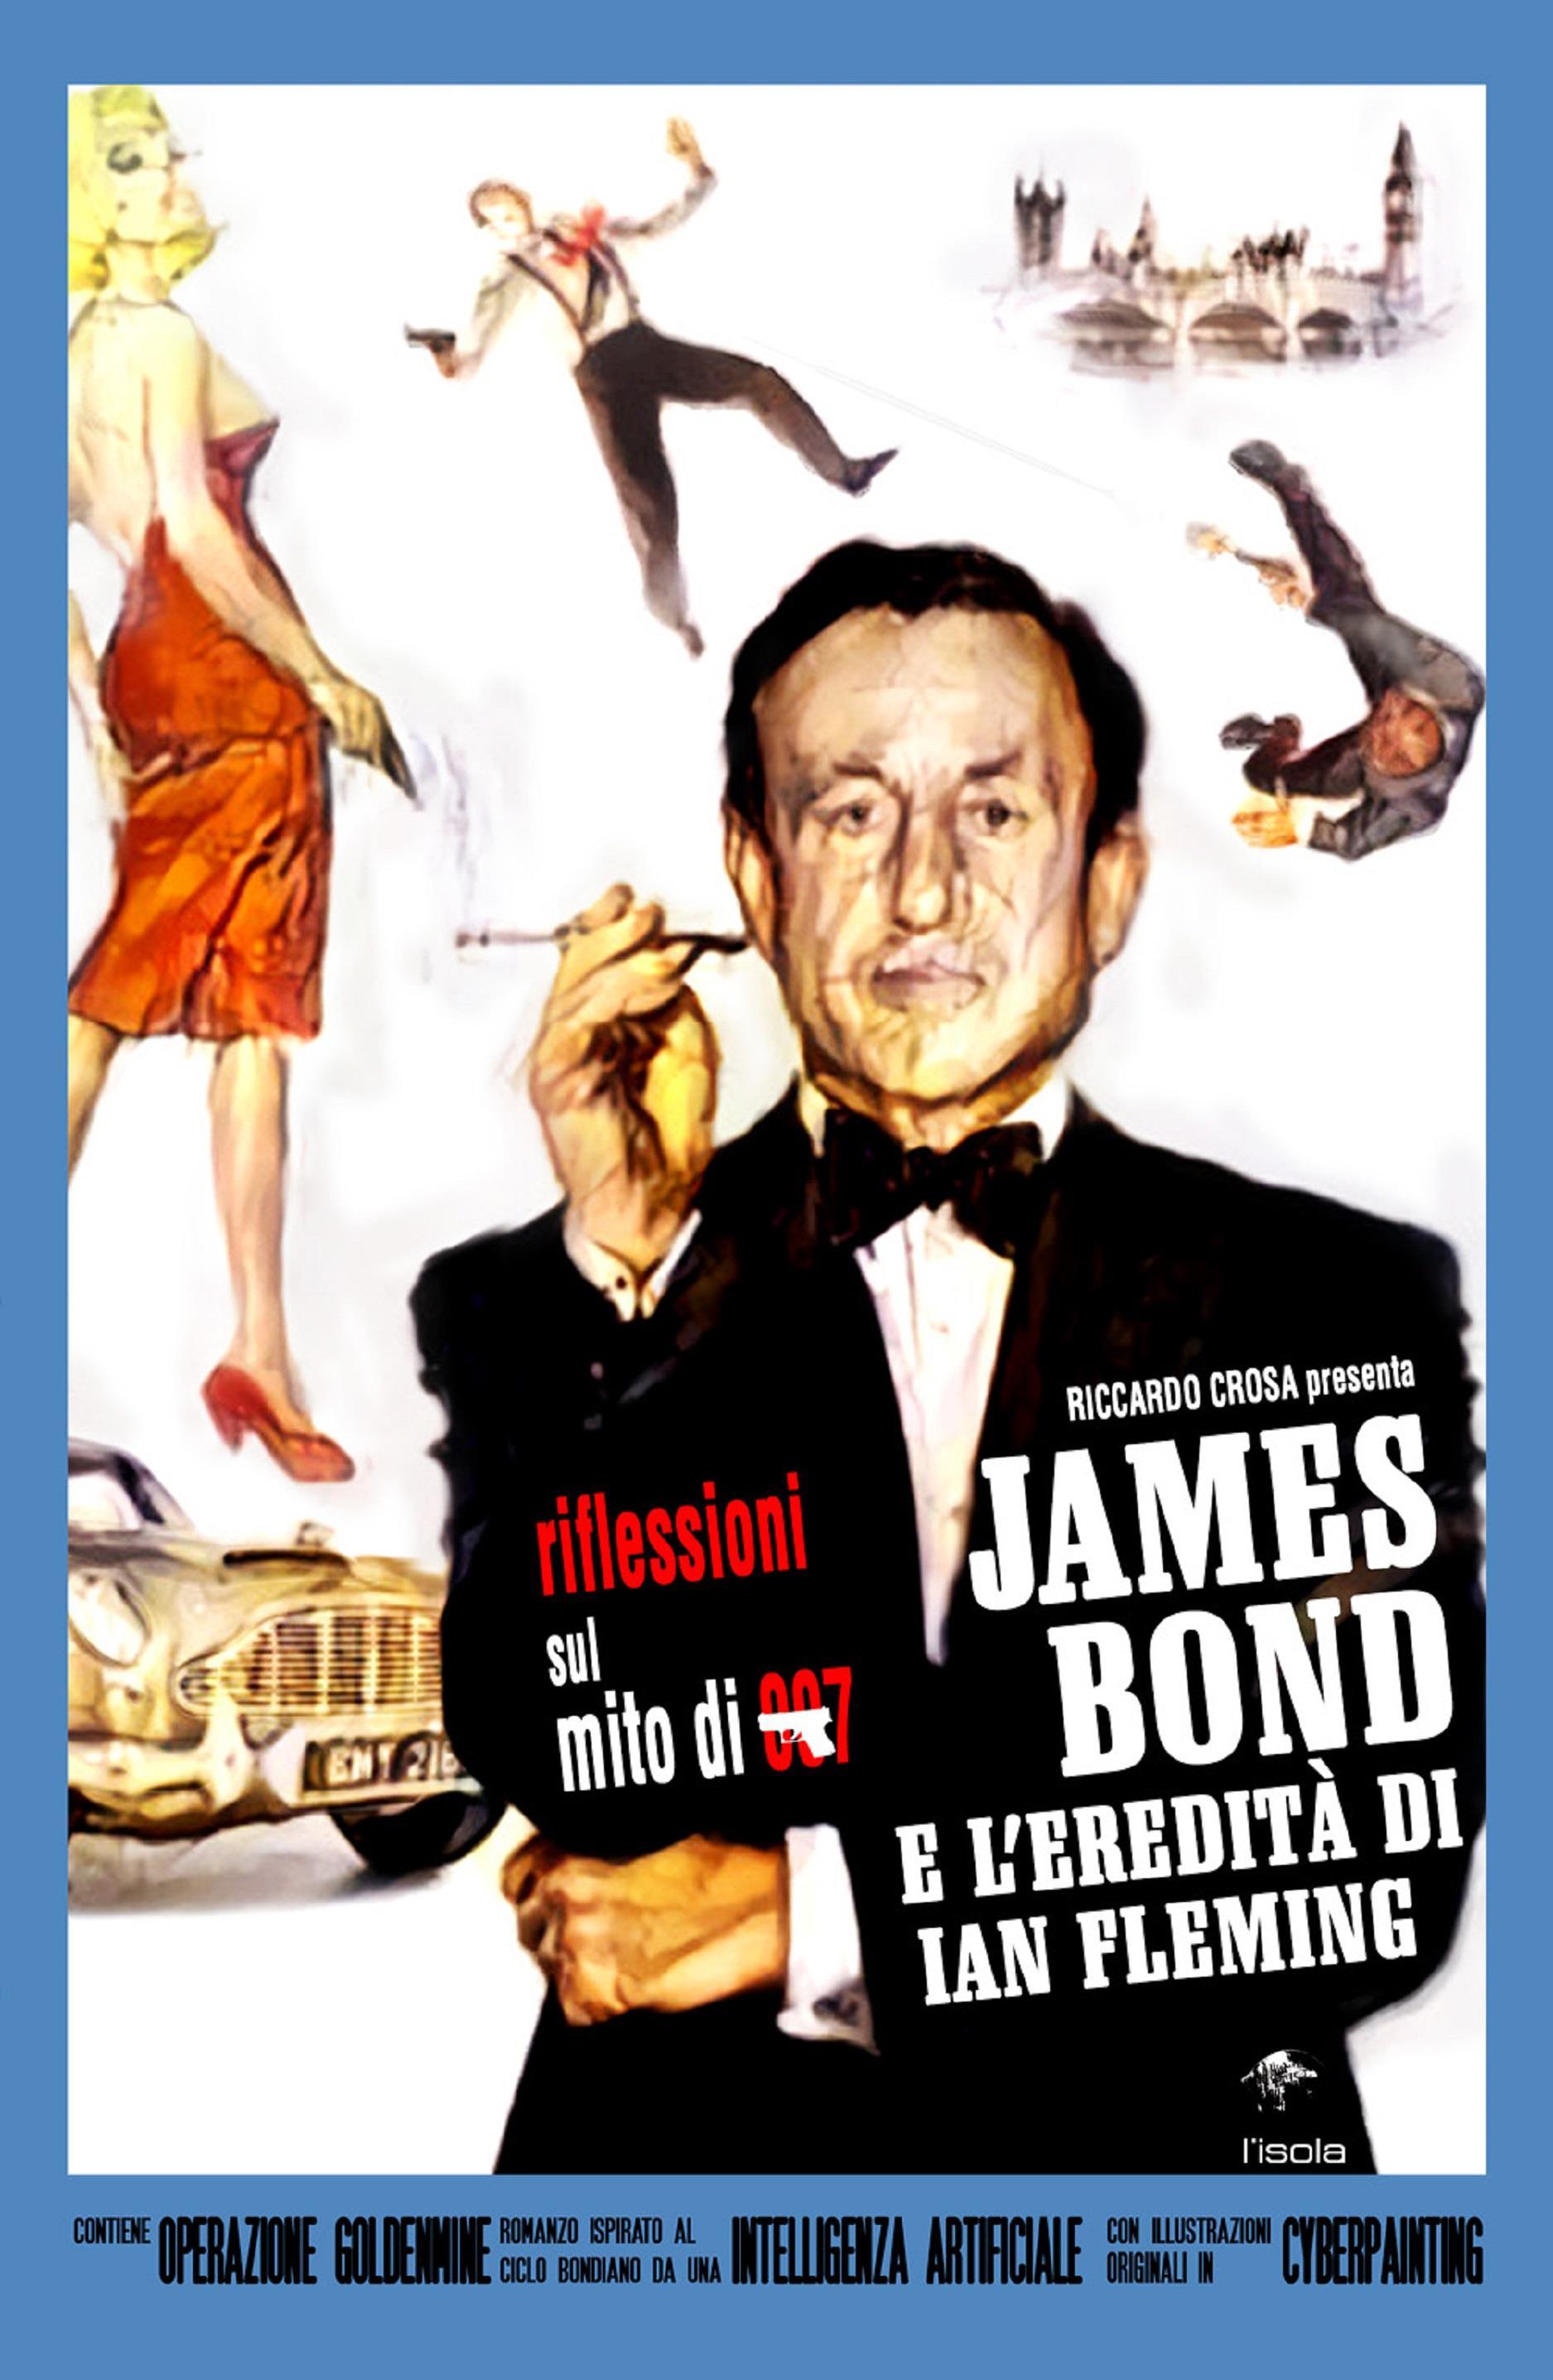 James Bond e l'eredità di Ian Fleming